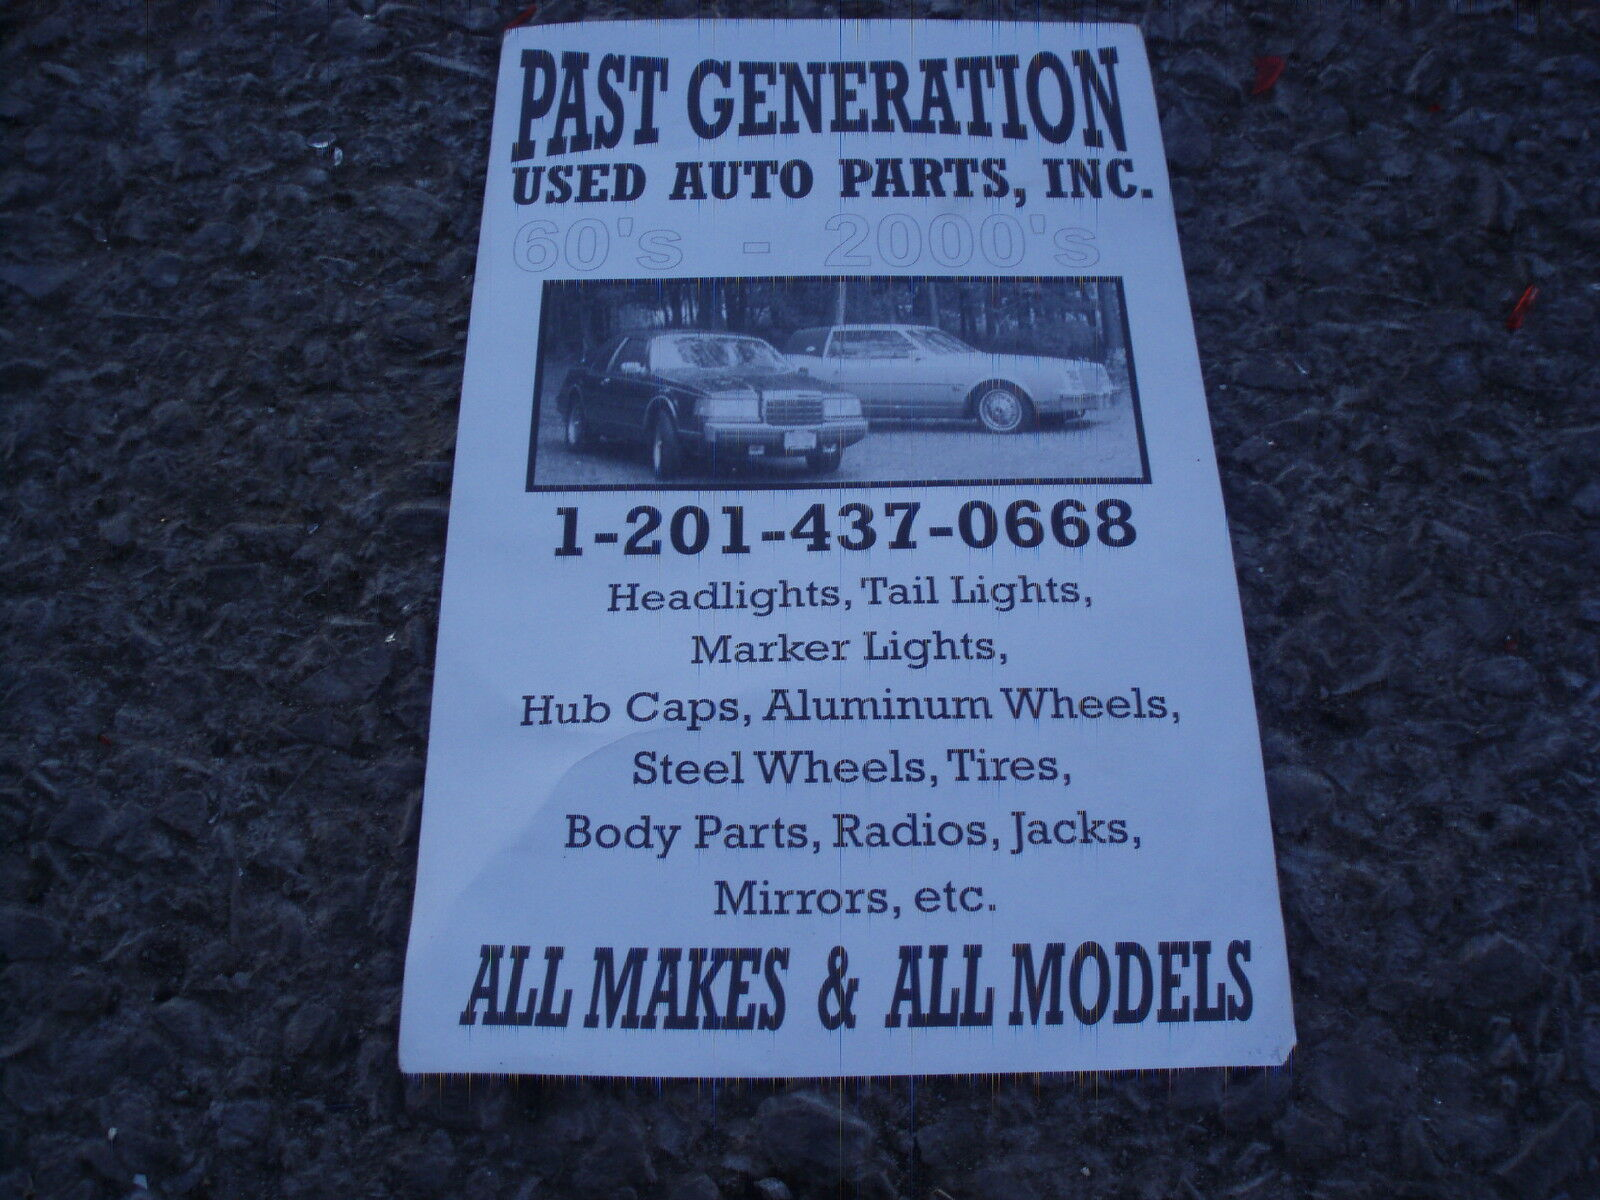 pastgenerationnj